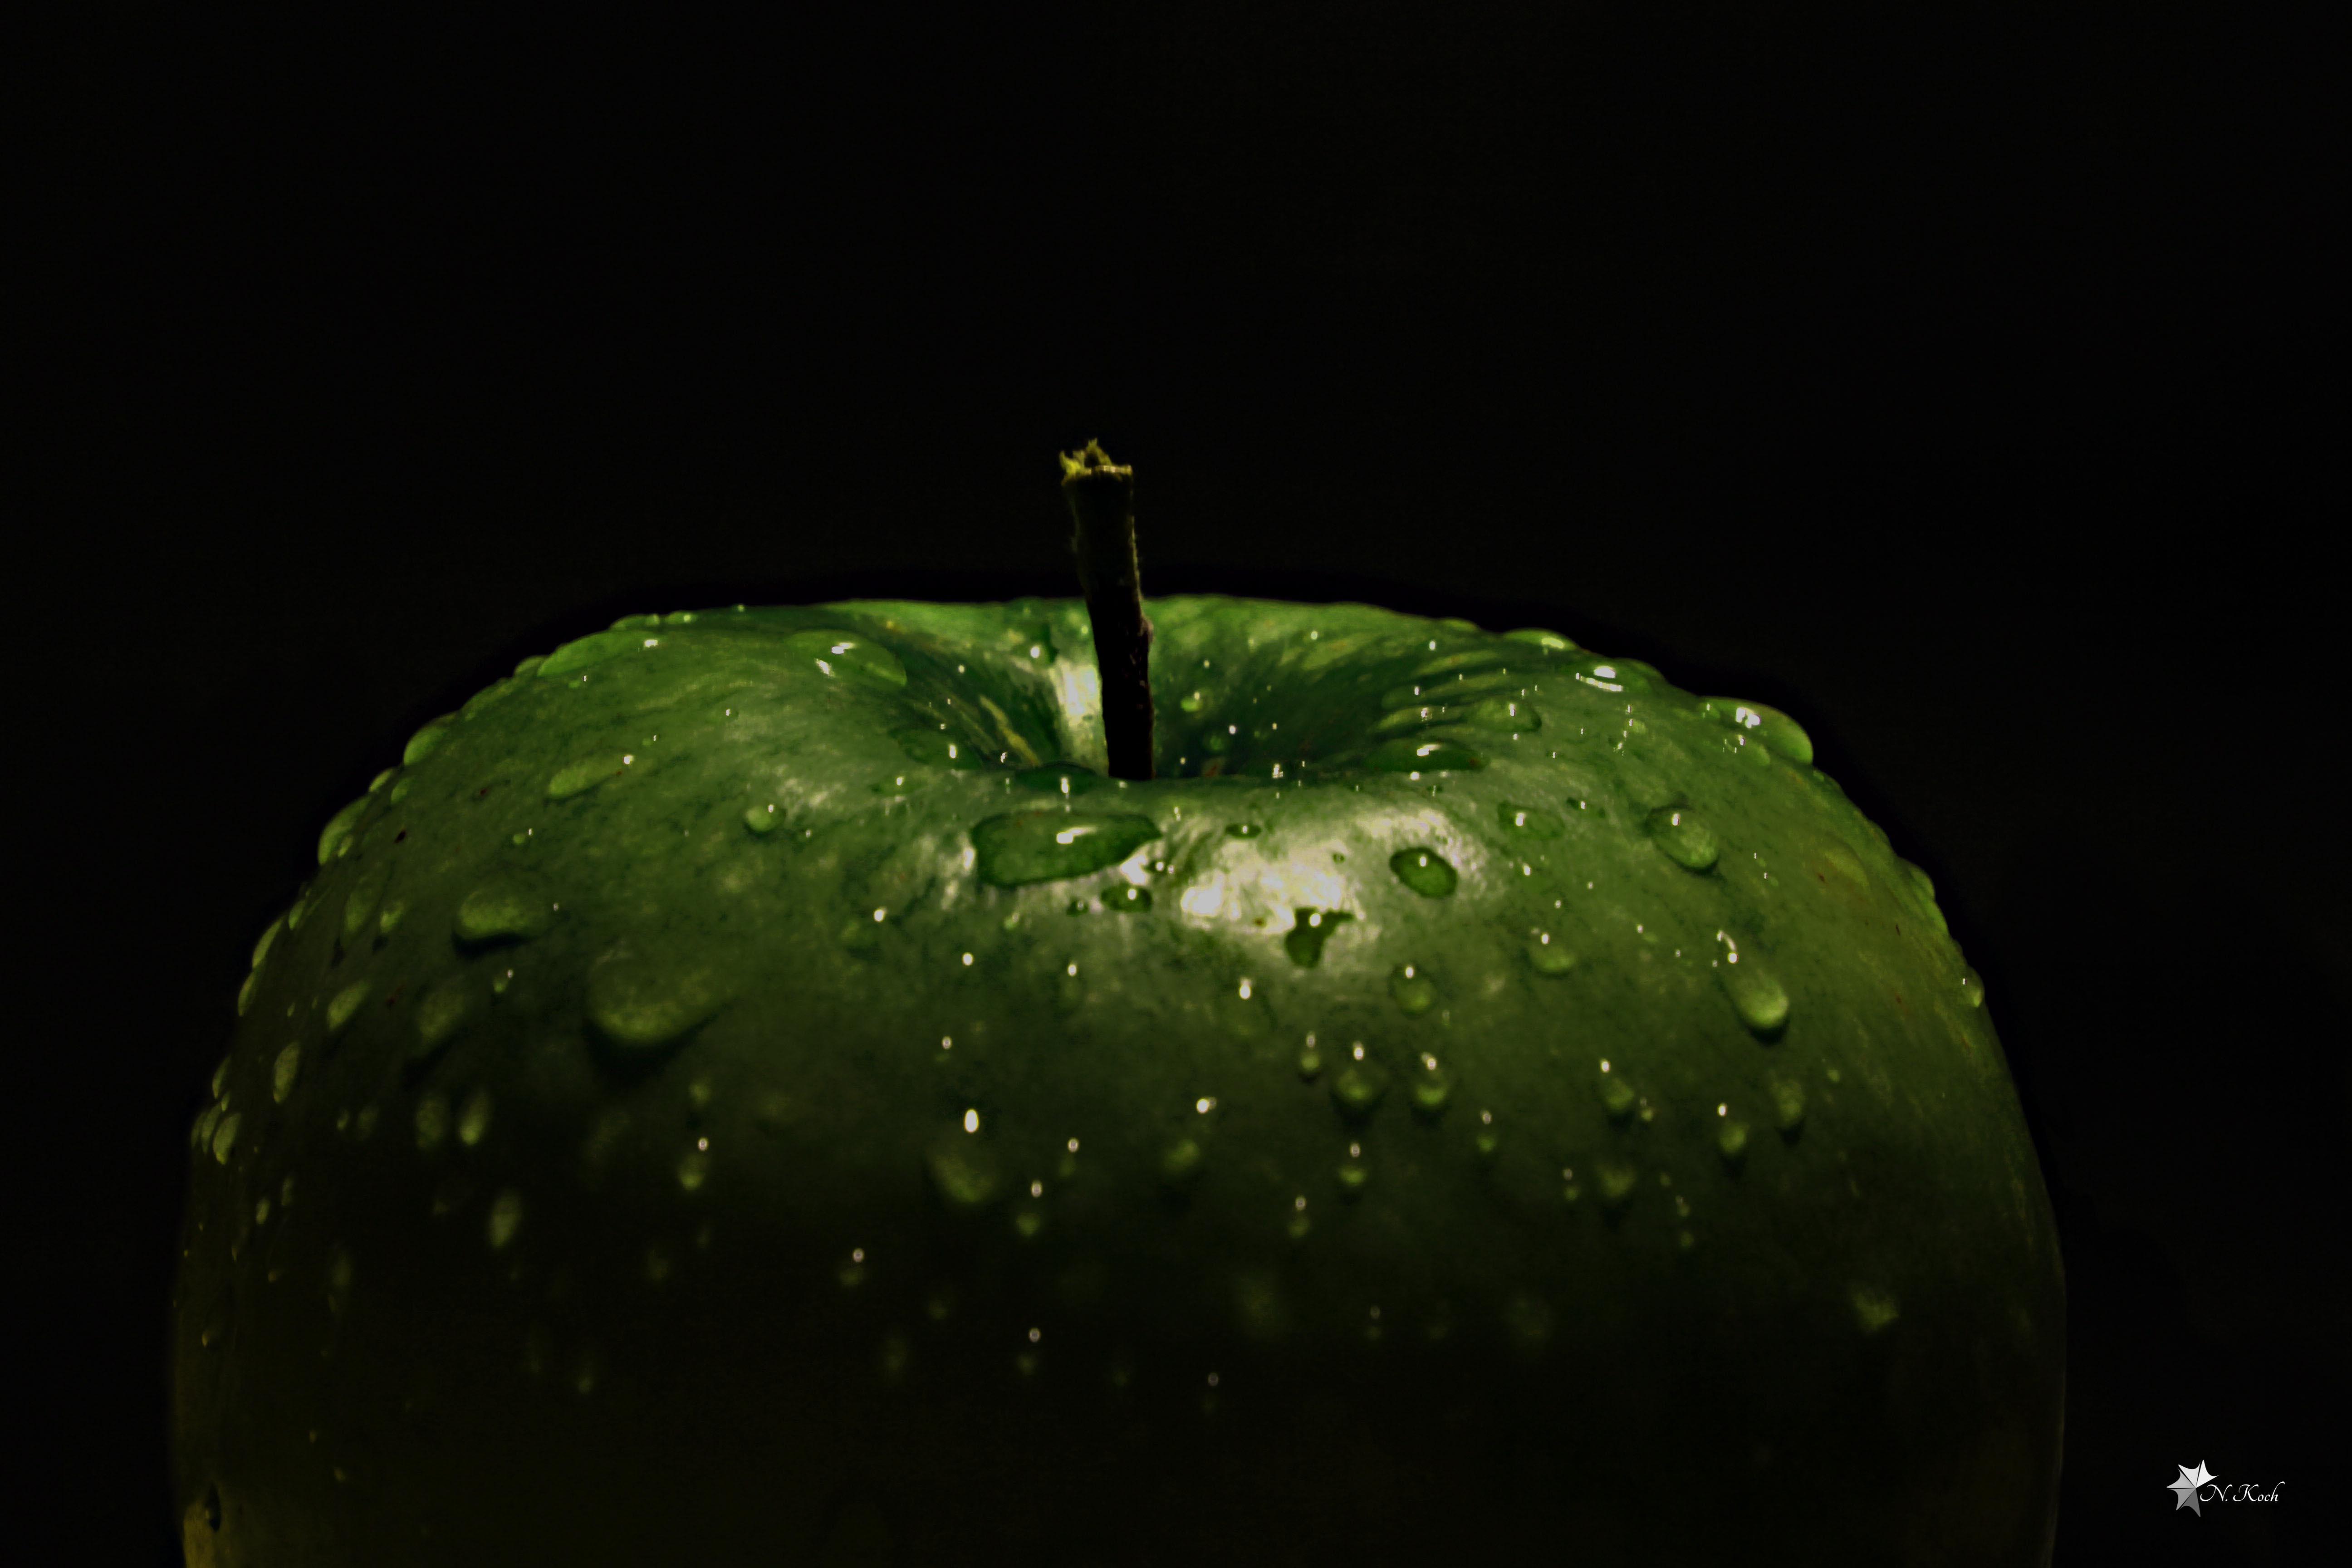 2014, Apple | Green apple in spotlight